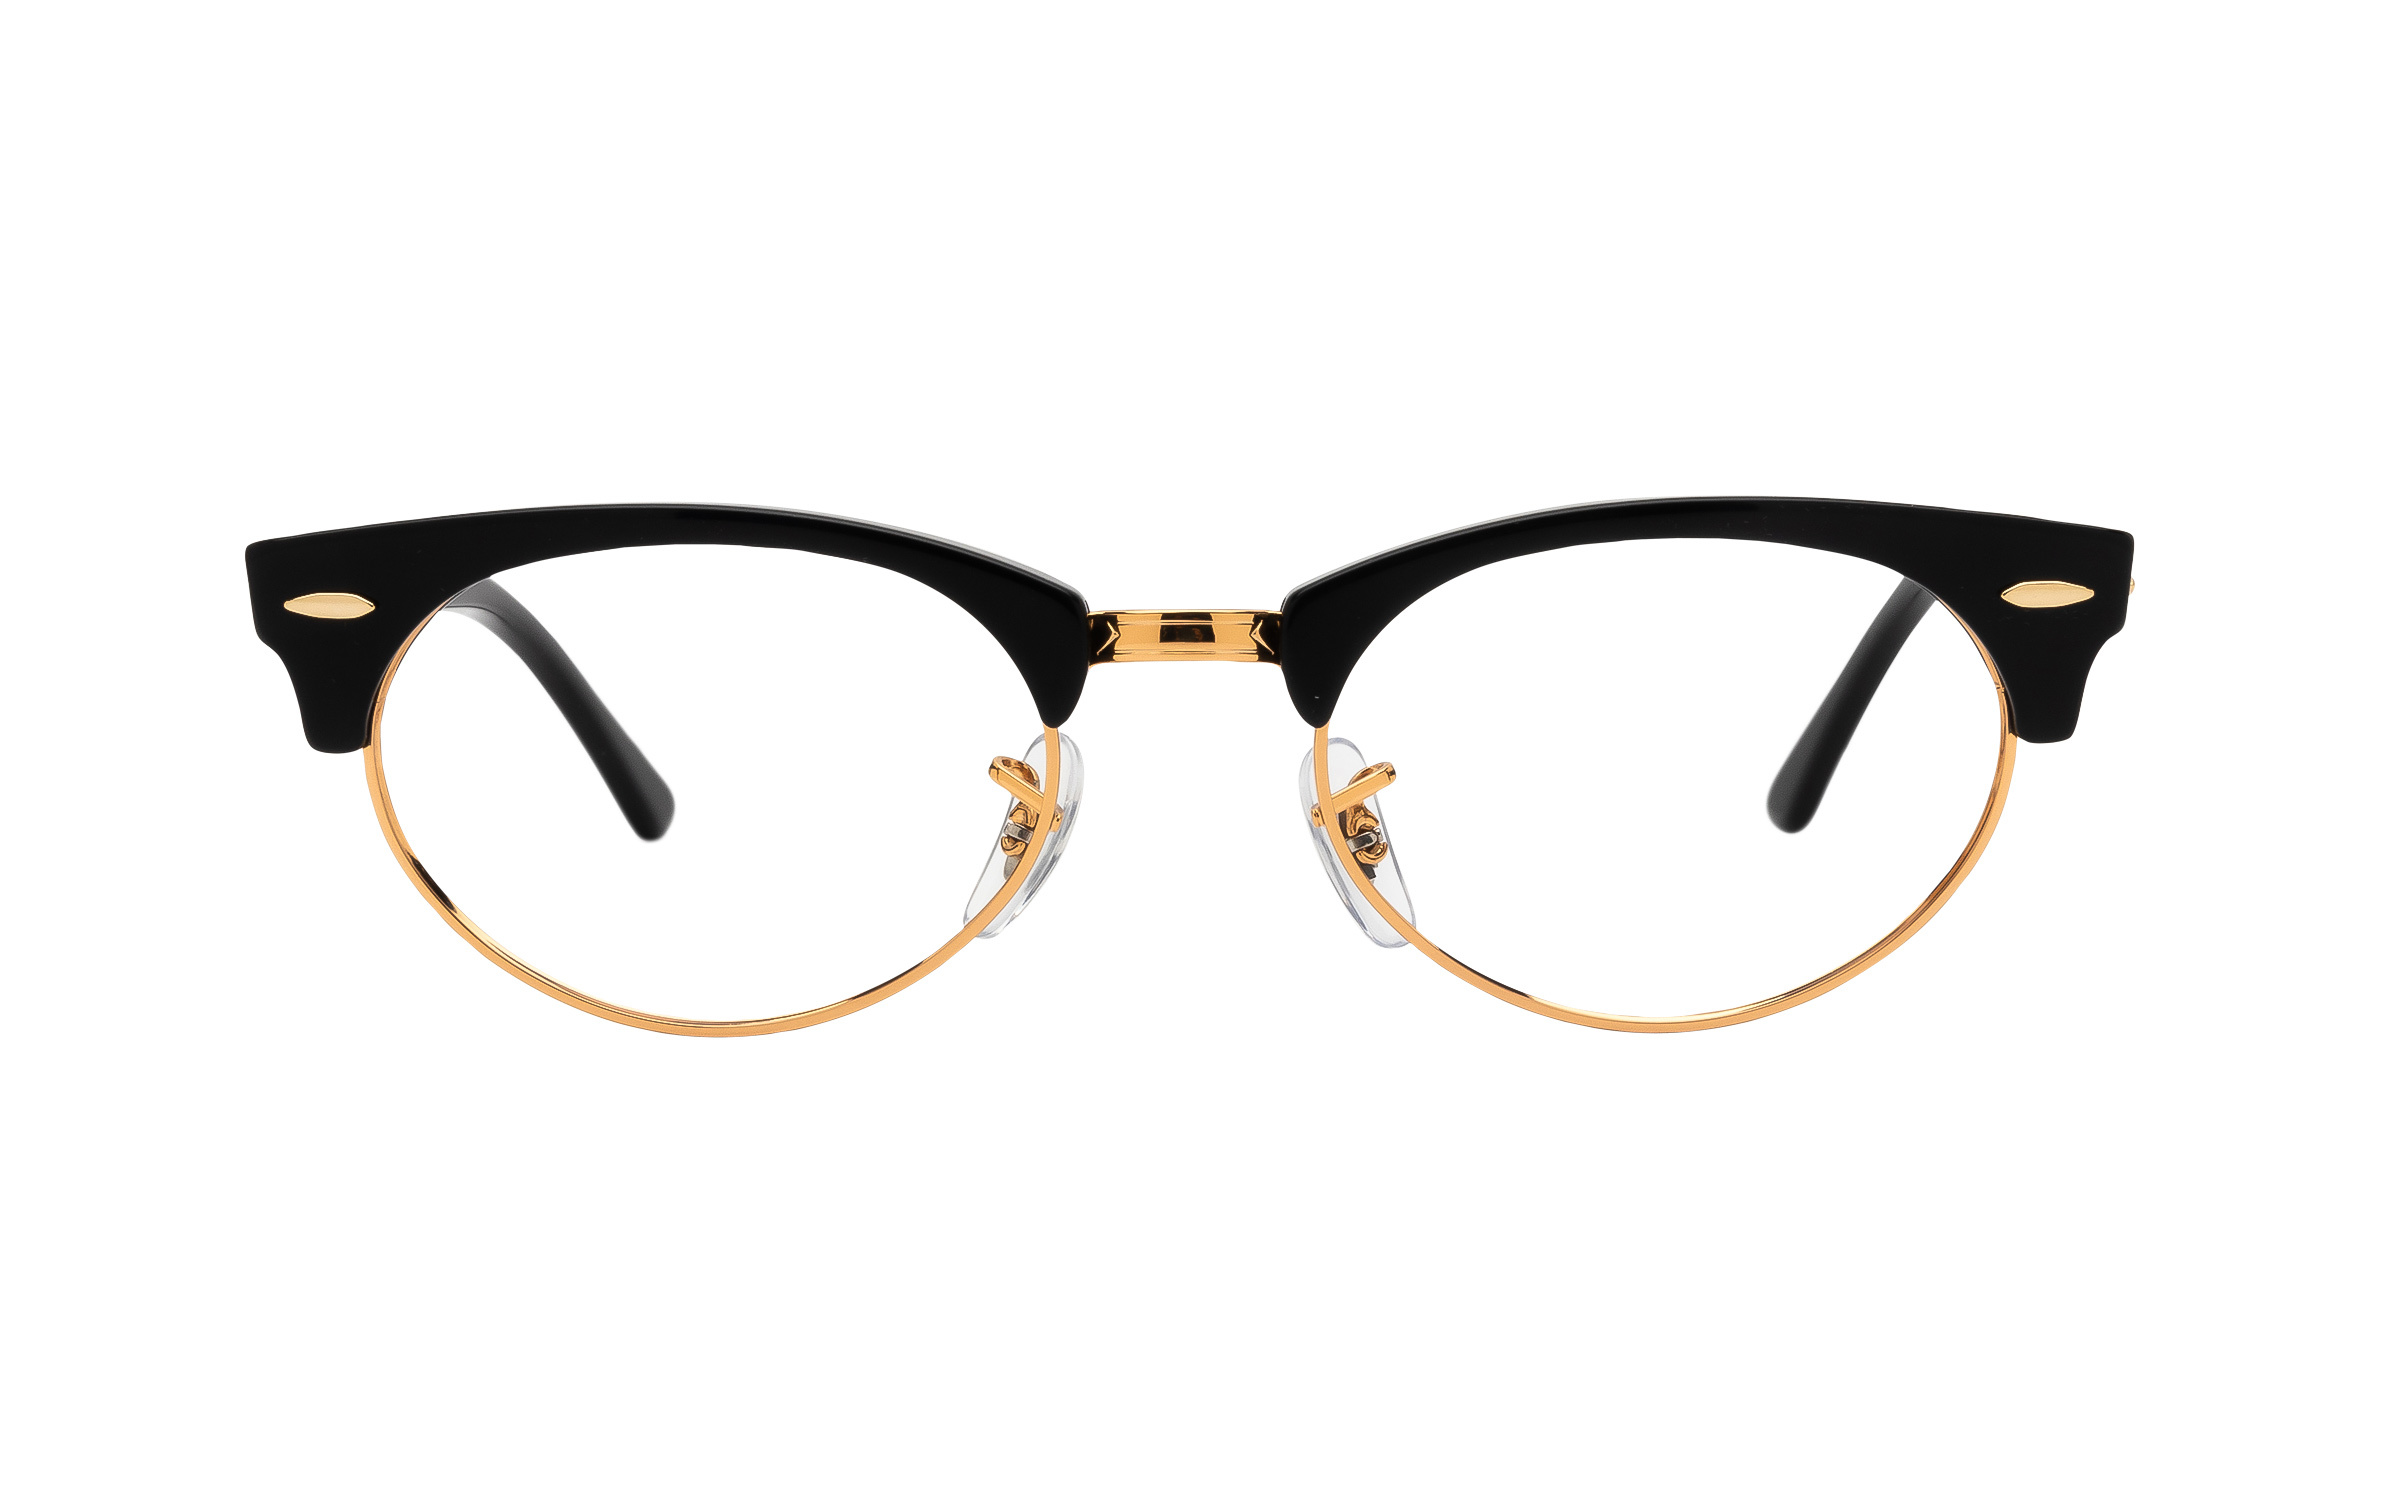 http://www.coastal.com/ - Ray-Ban Clubmaster Oval RX3946V 8057 (50) Eyeglasses and Frame in Black | Acetate/Metal – Online Coastal